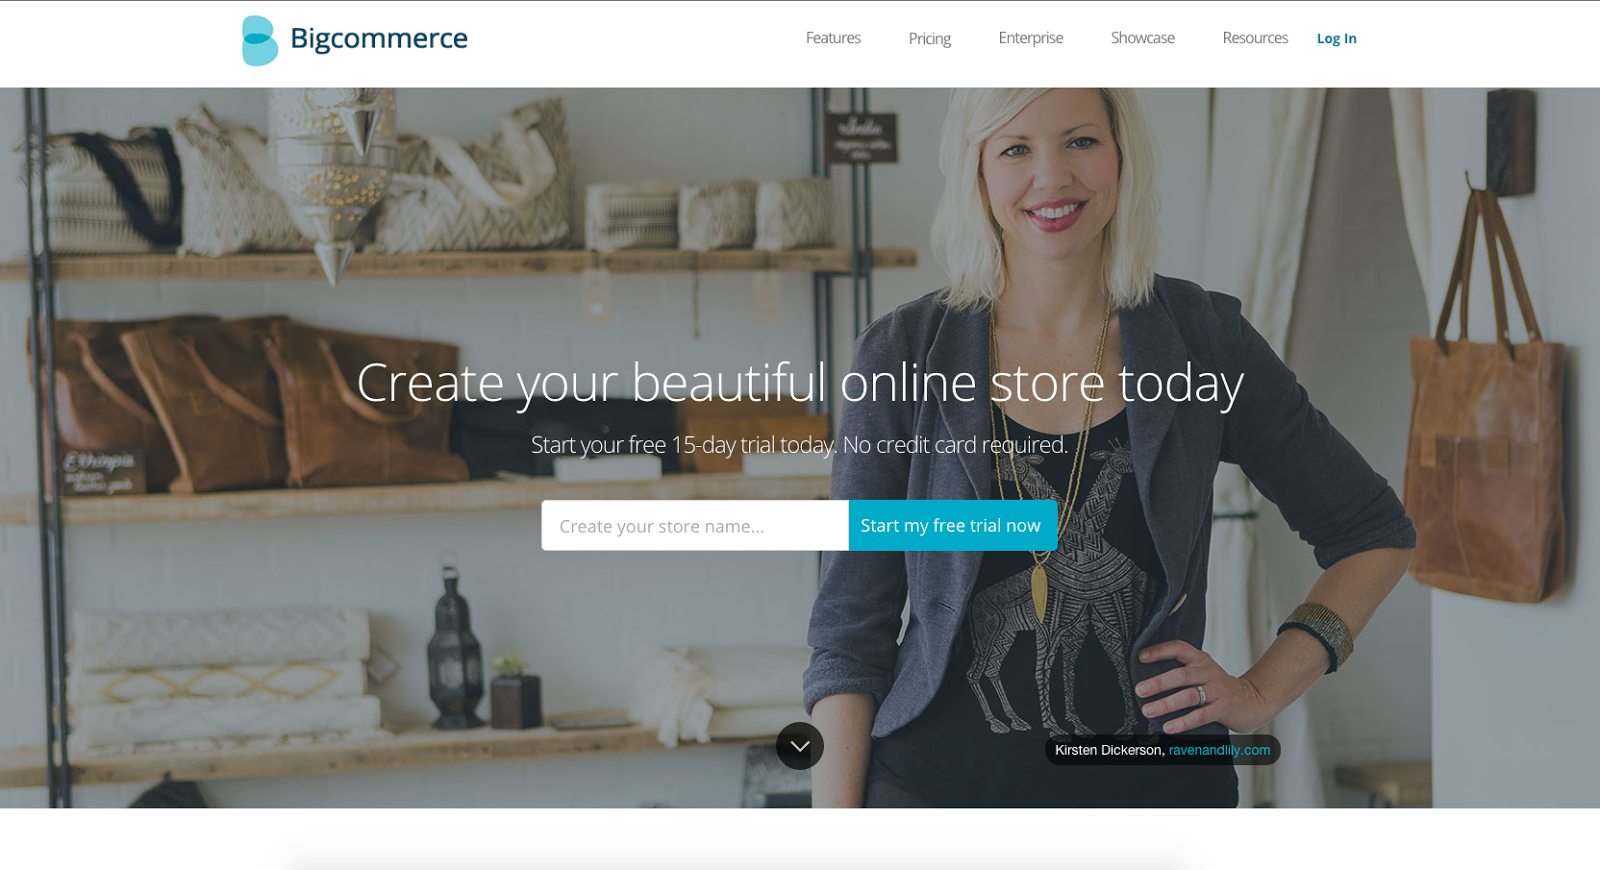 saas-value-propositions-6-big-commerce